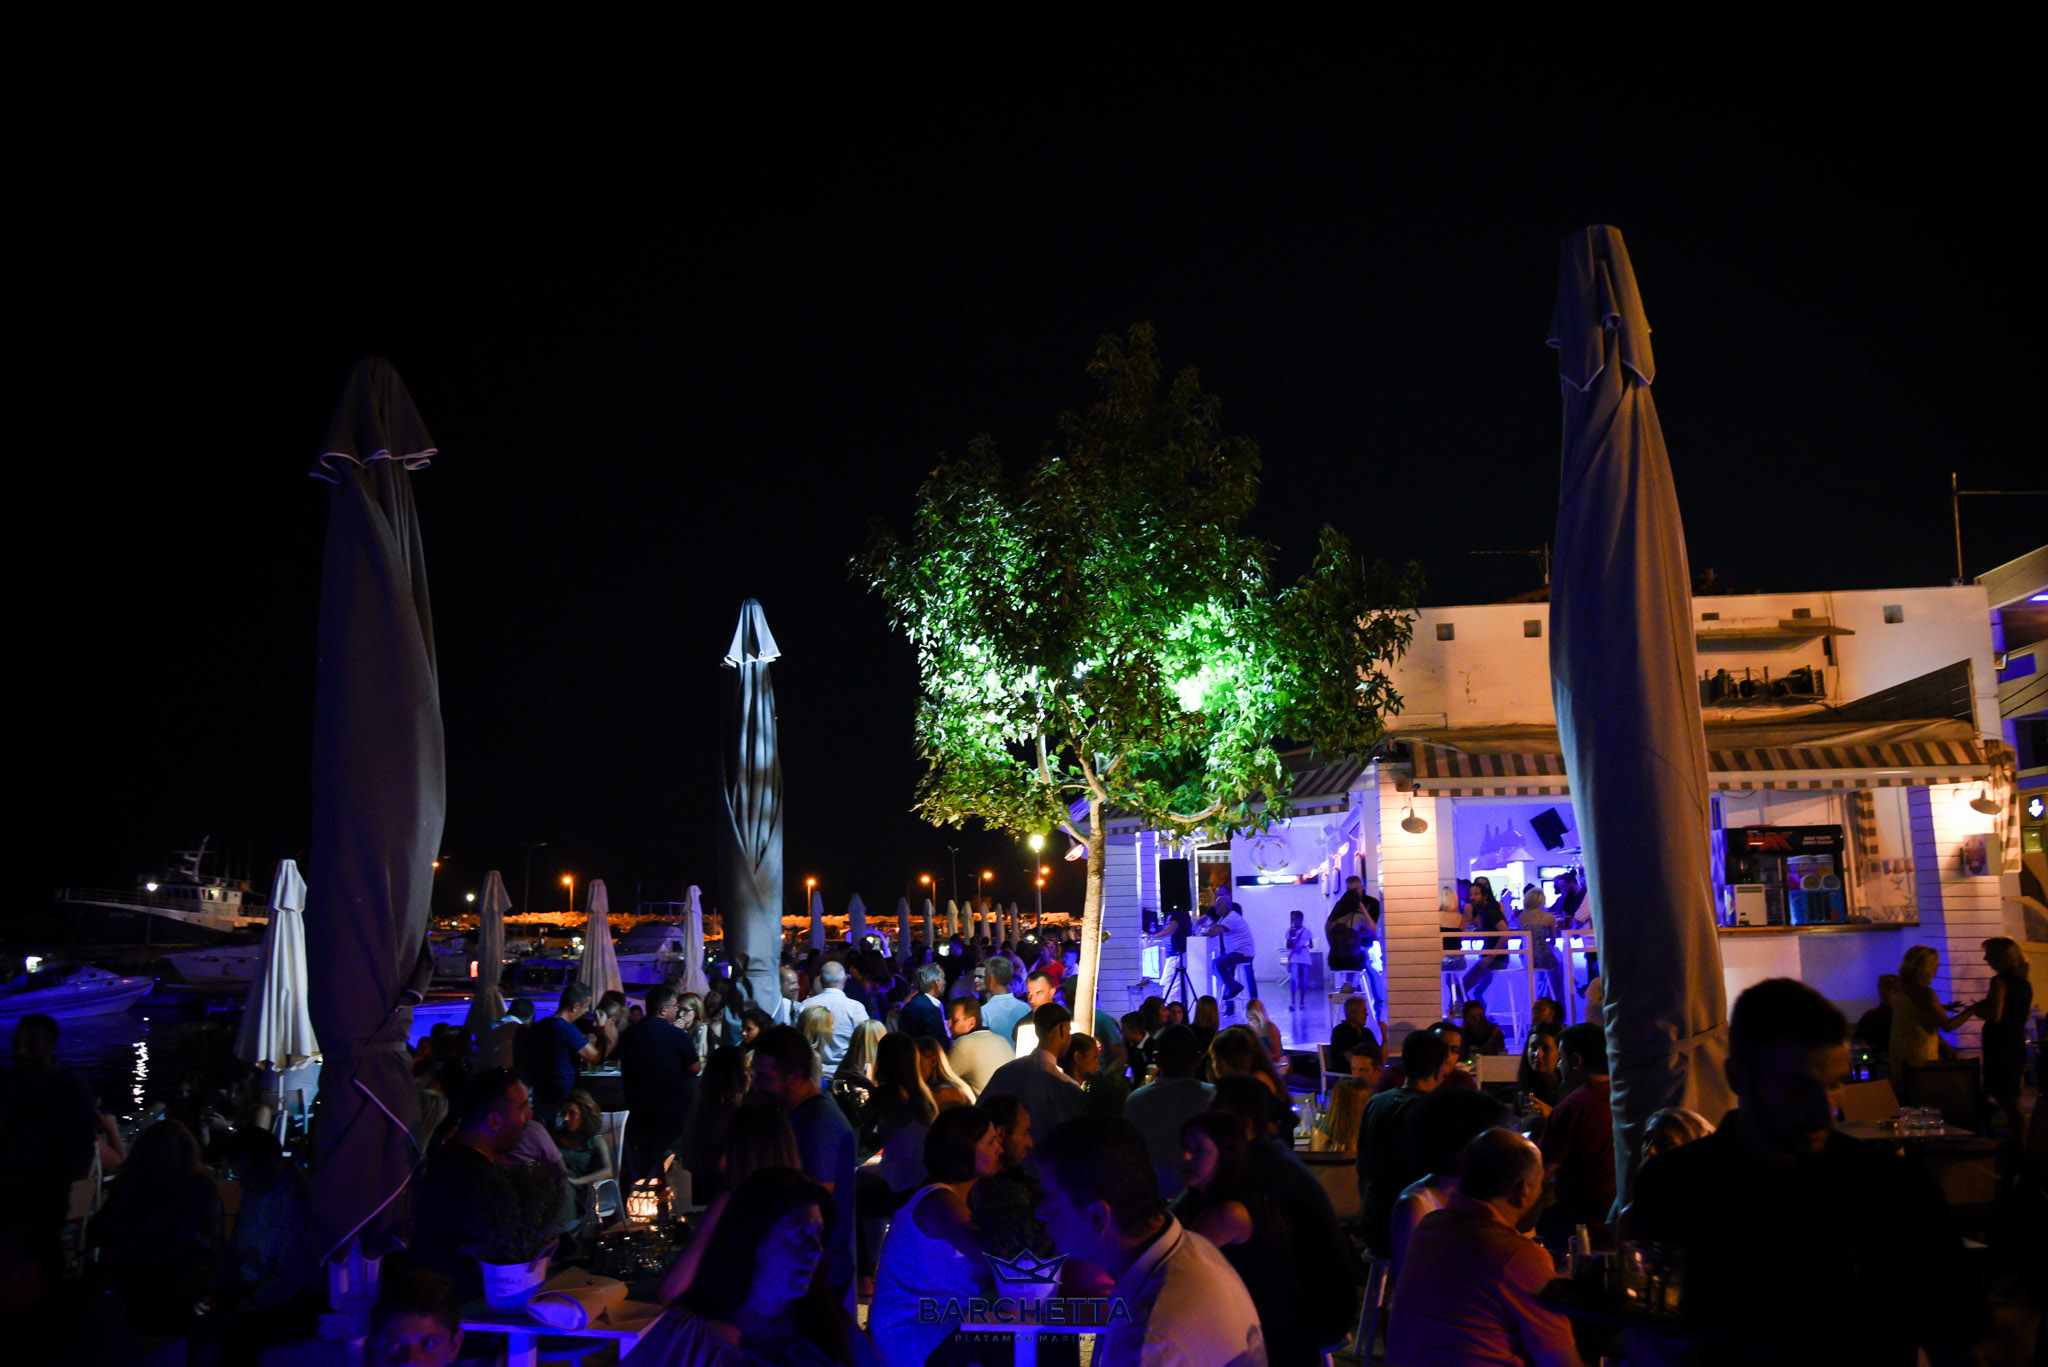 DSC 7141 - Barchetta | Σάββατο 5.8.2017